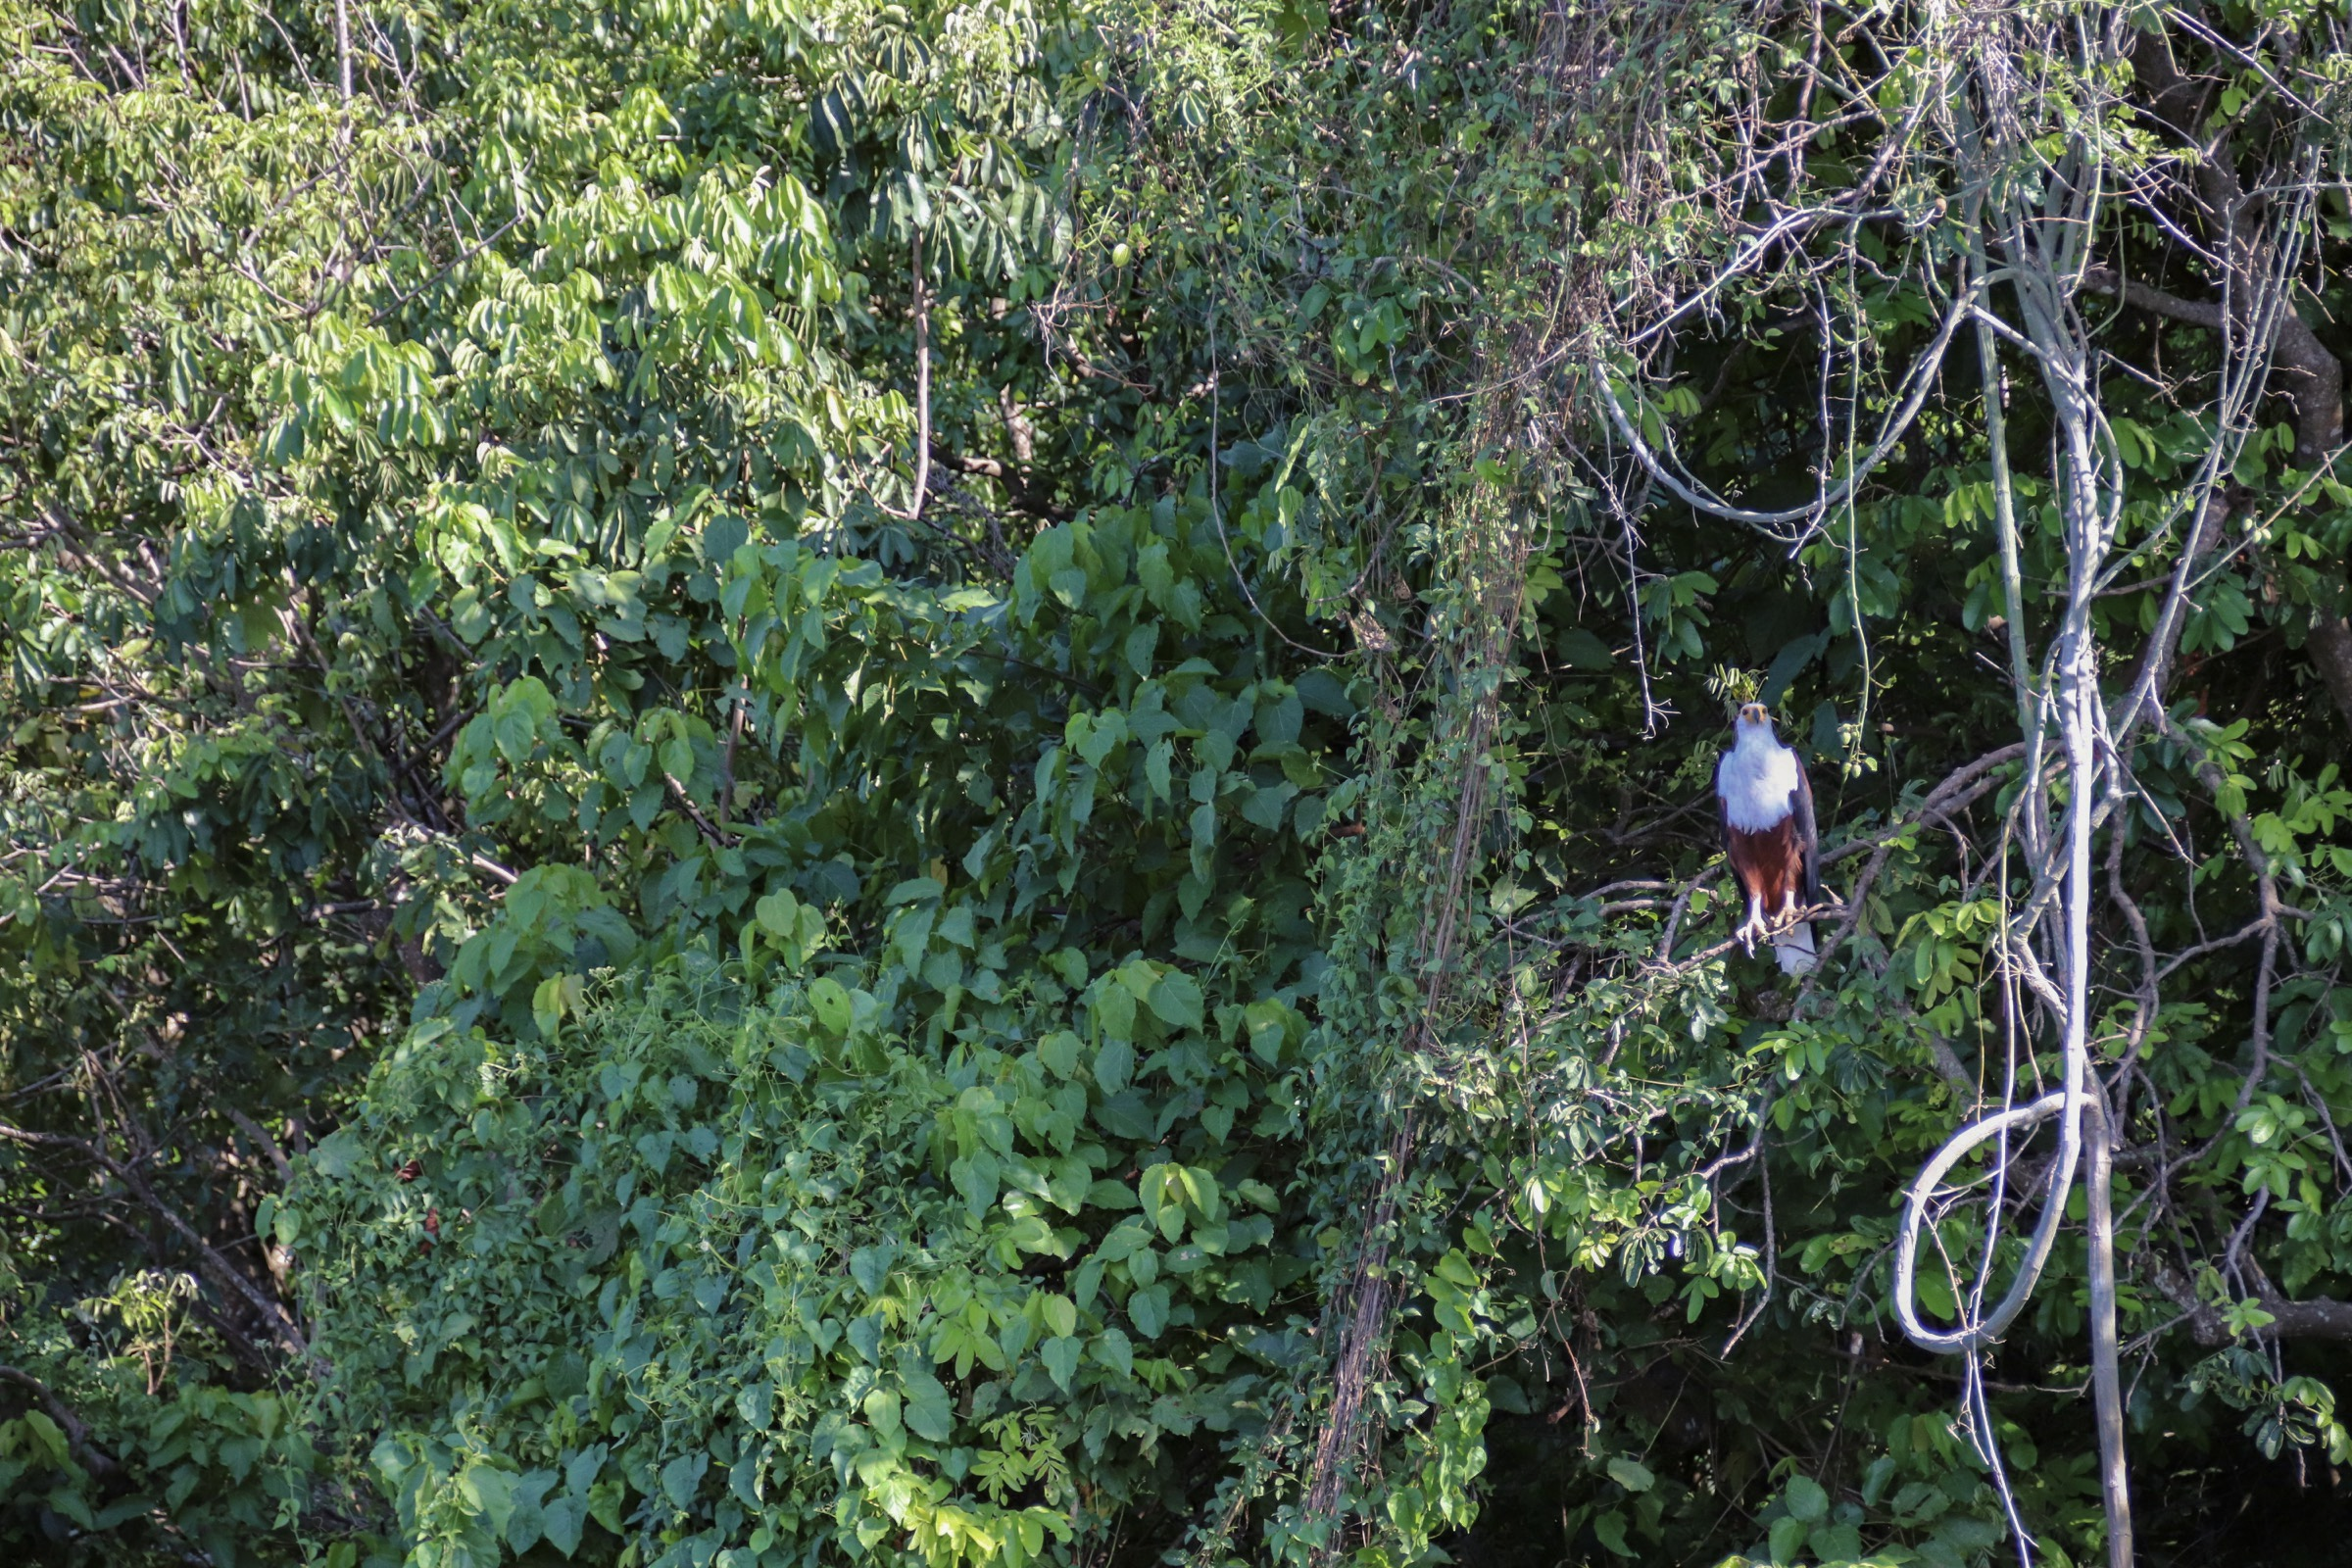 11-Day Primates and Birding Safaris in Uganda - The Pearl of Africa 9